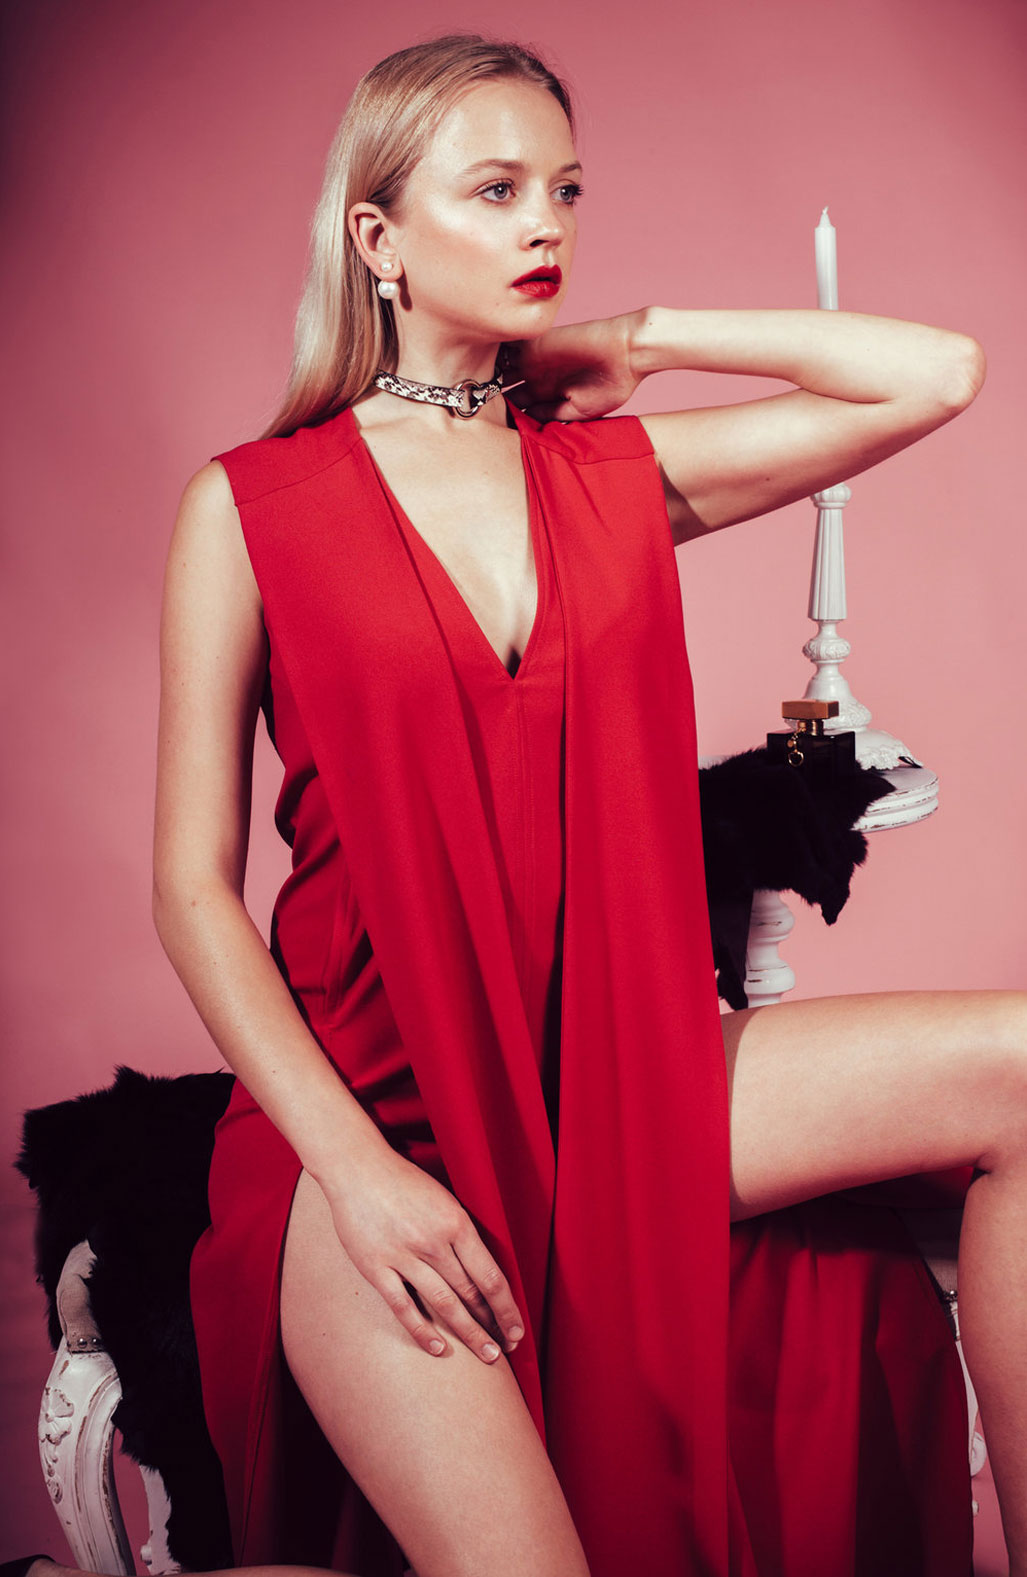 Светлана Легун в рекламной кампании Wicca collection 2016 / фото 07